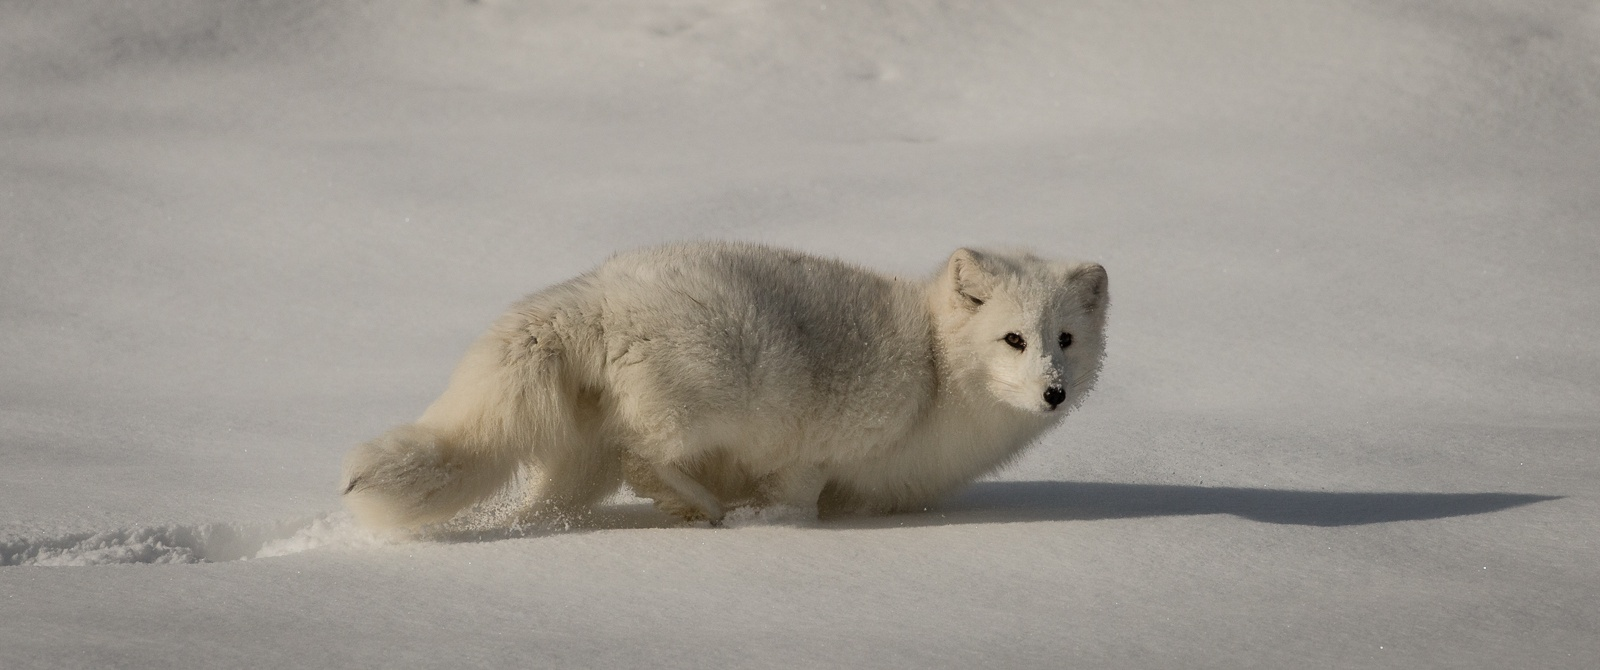 190-Artic-Fox